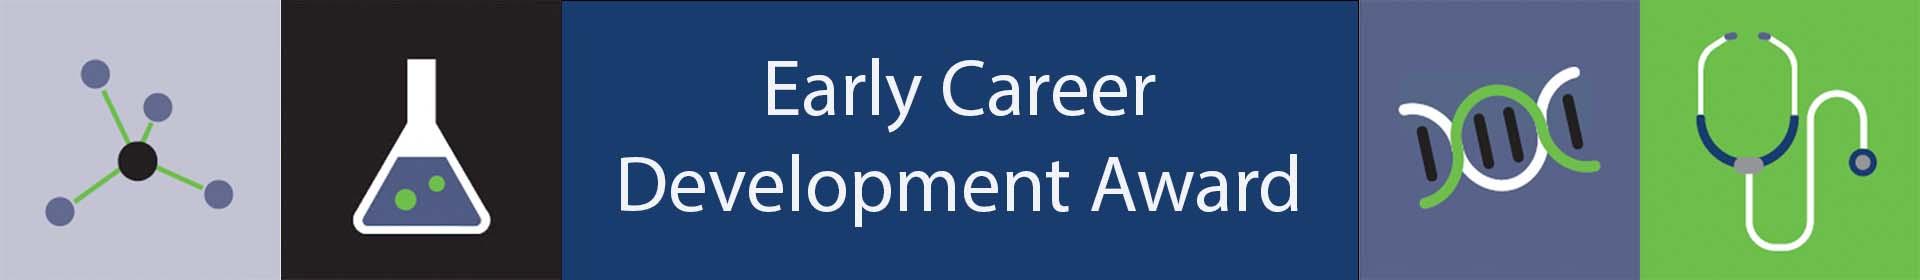 2022 CSCTR Early Career Development Award Event Banner